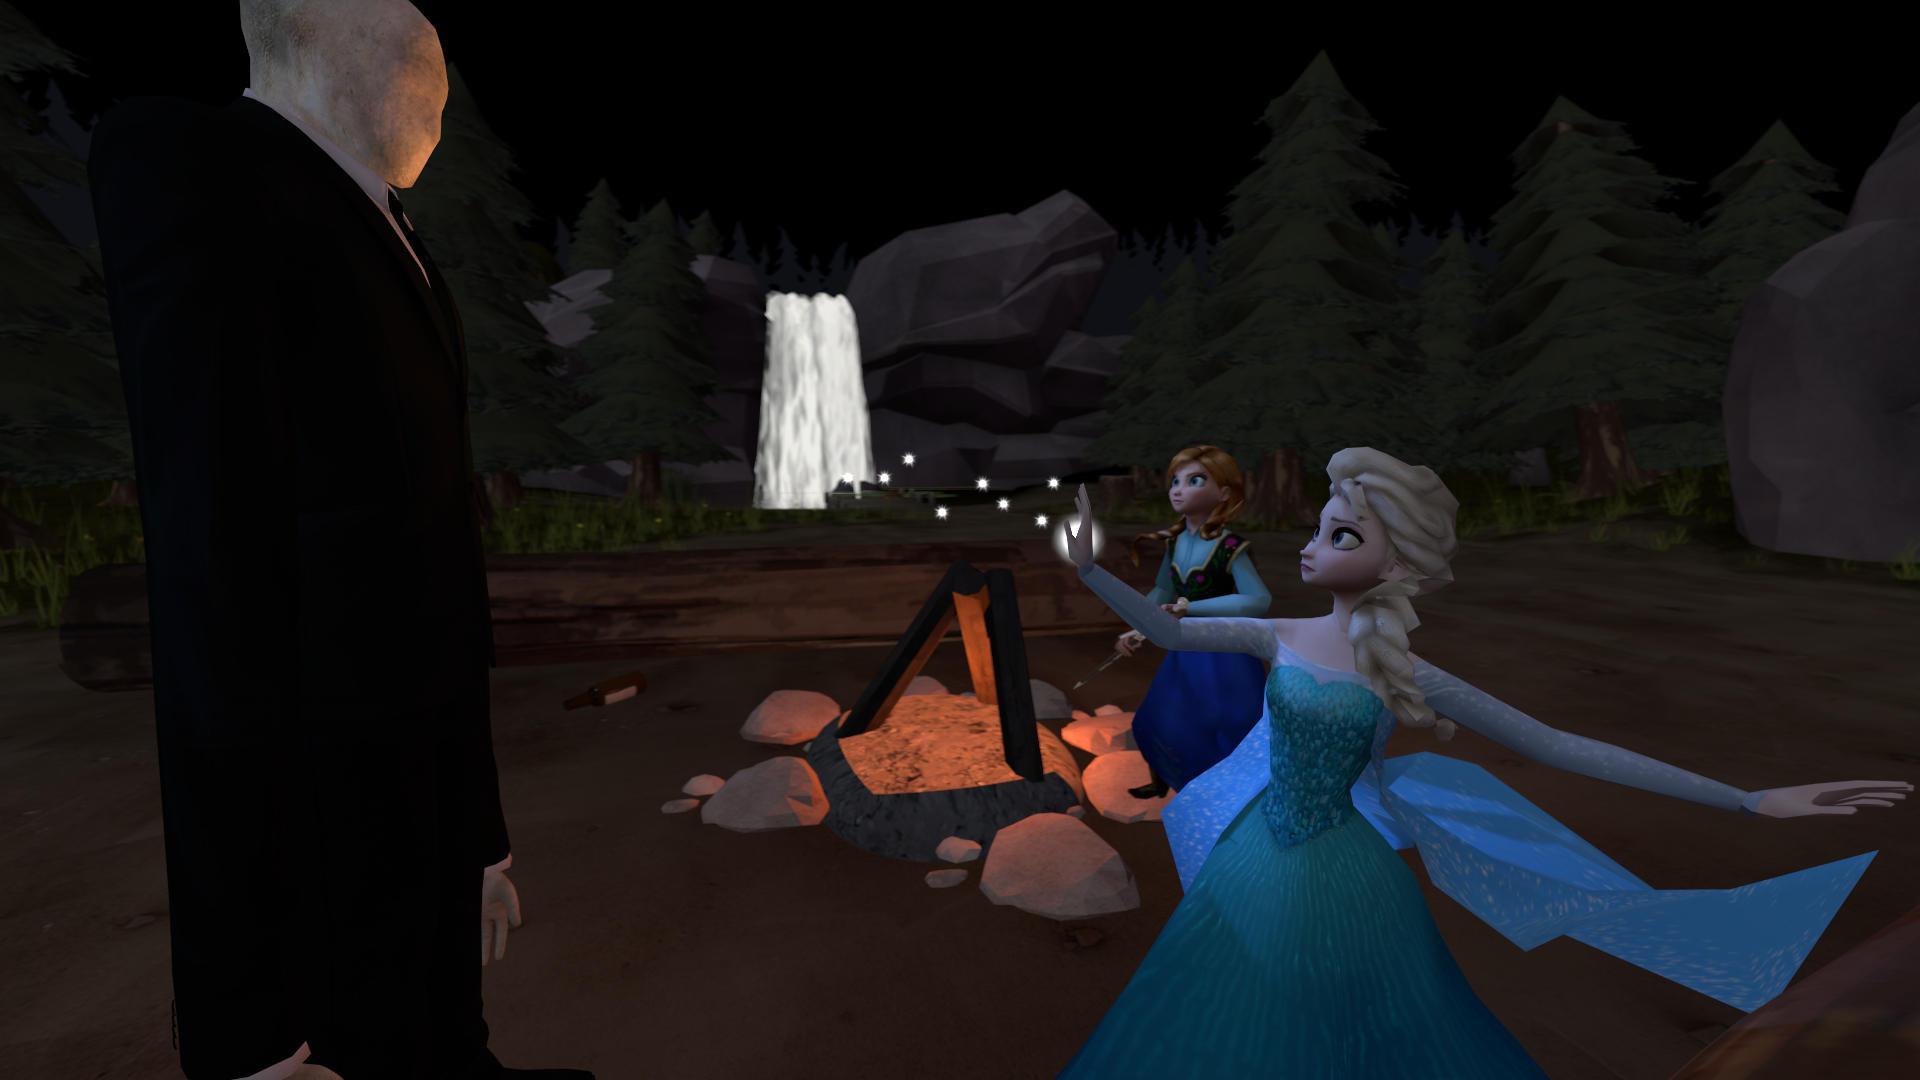 Elsa and Anna Against Slenderman by Lilyflower341